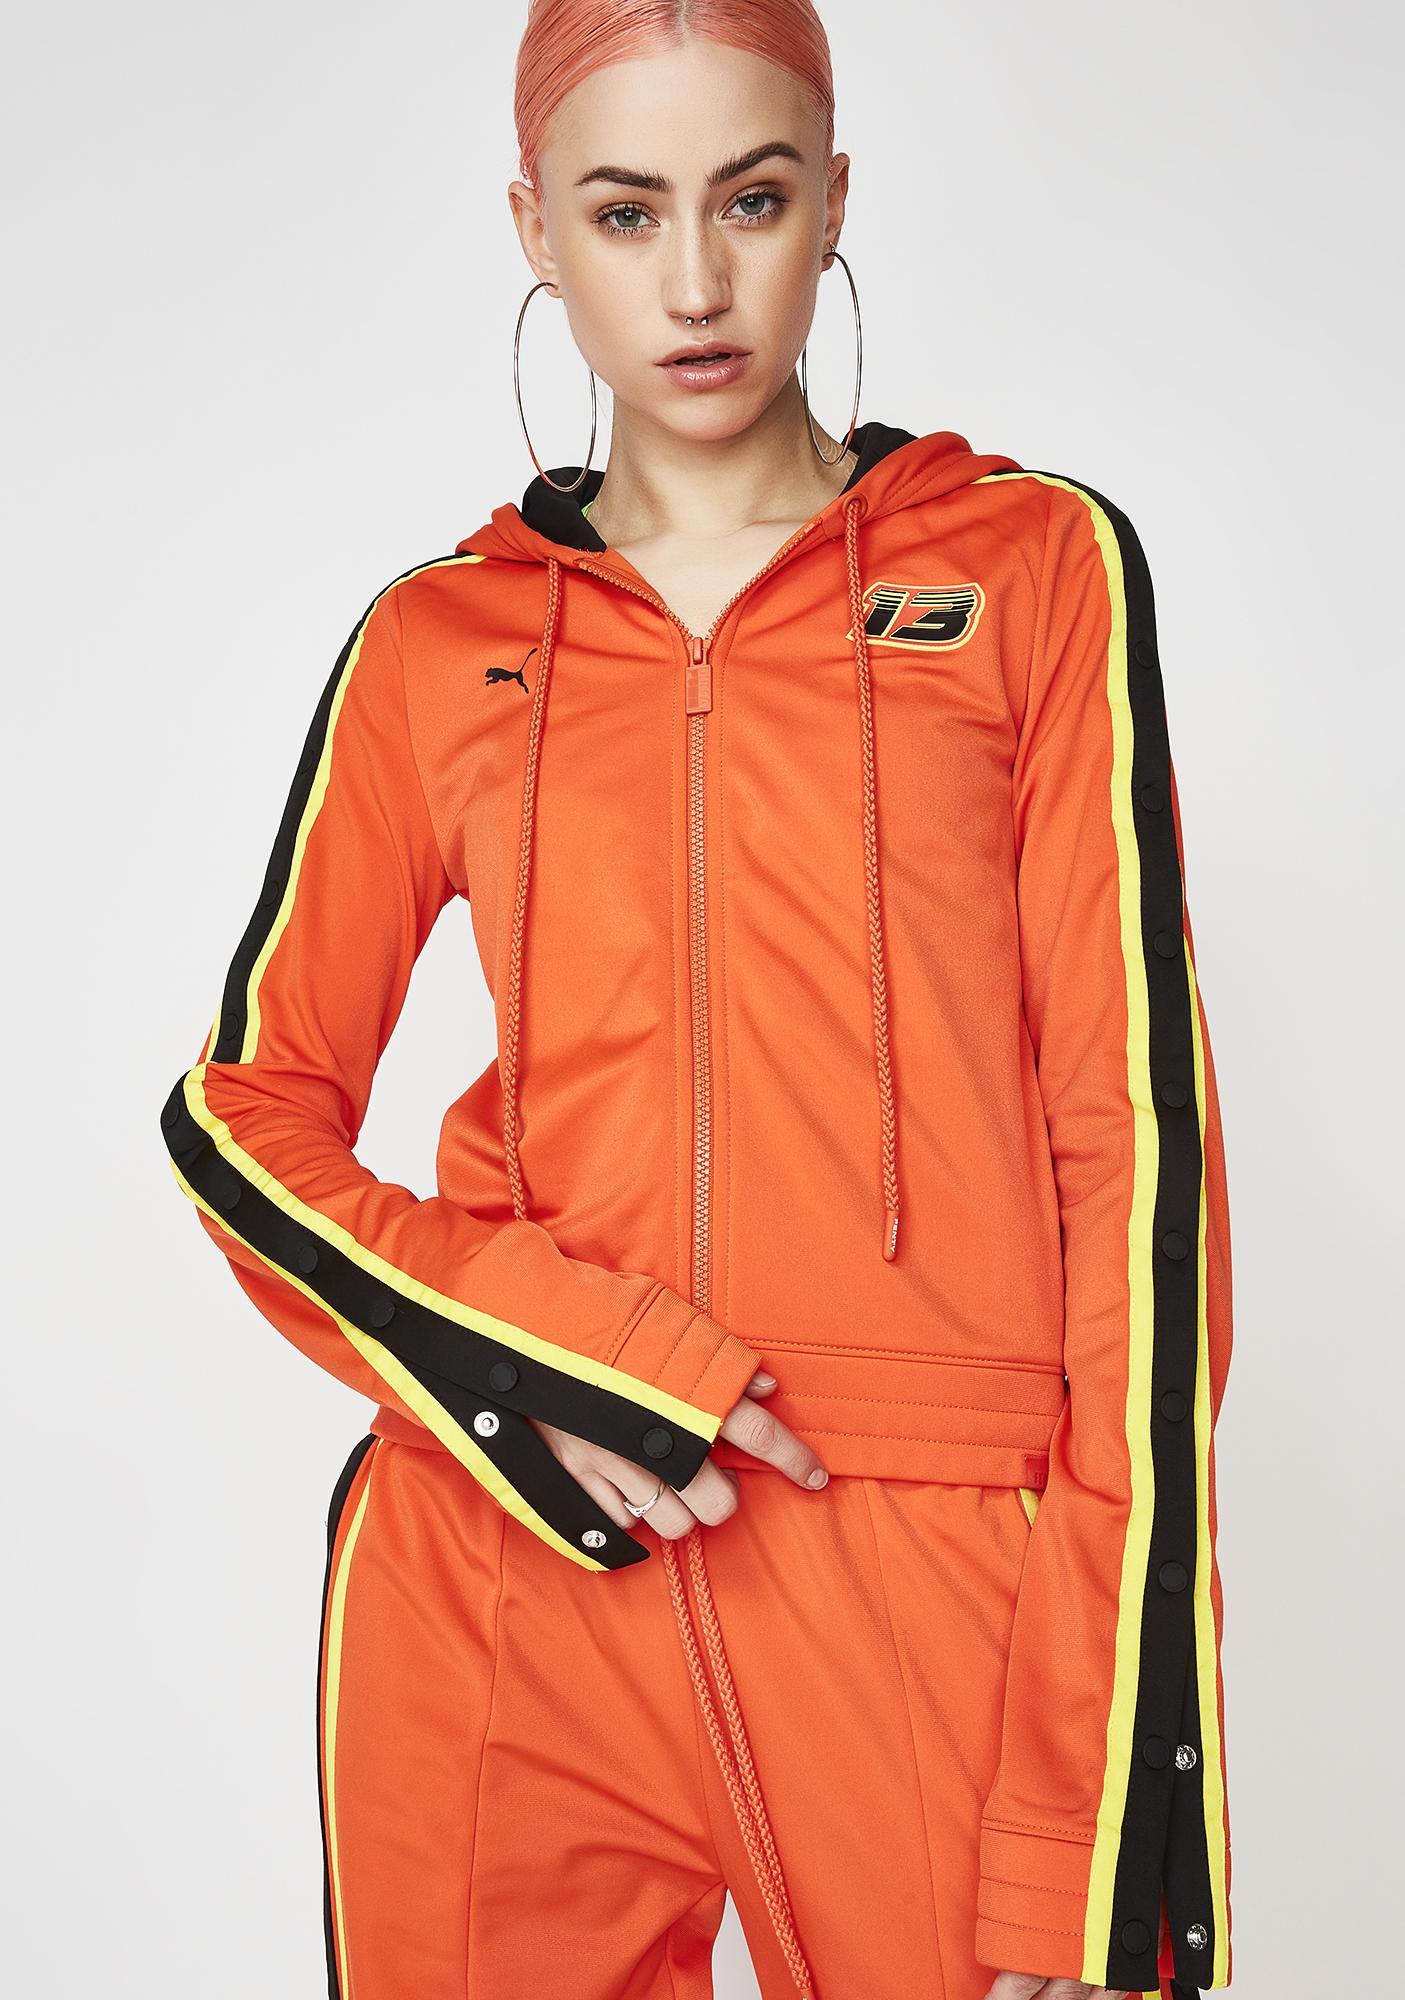 0f85353519a4 PUMA FENTY PUMA By Rihanna Fitted Tearaway Track Jacket